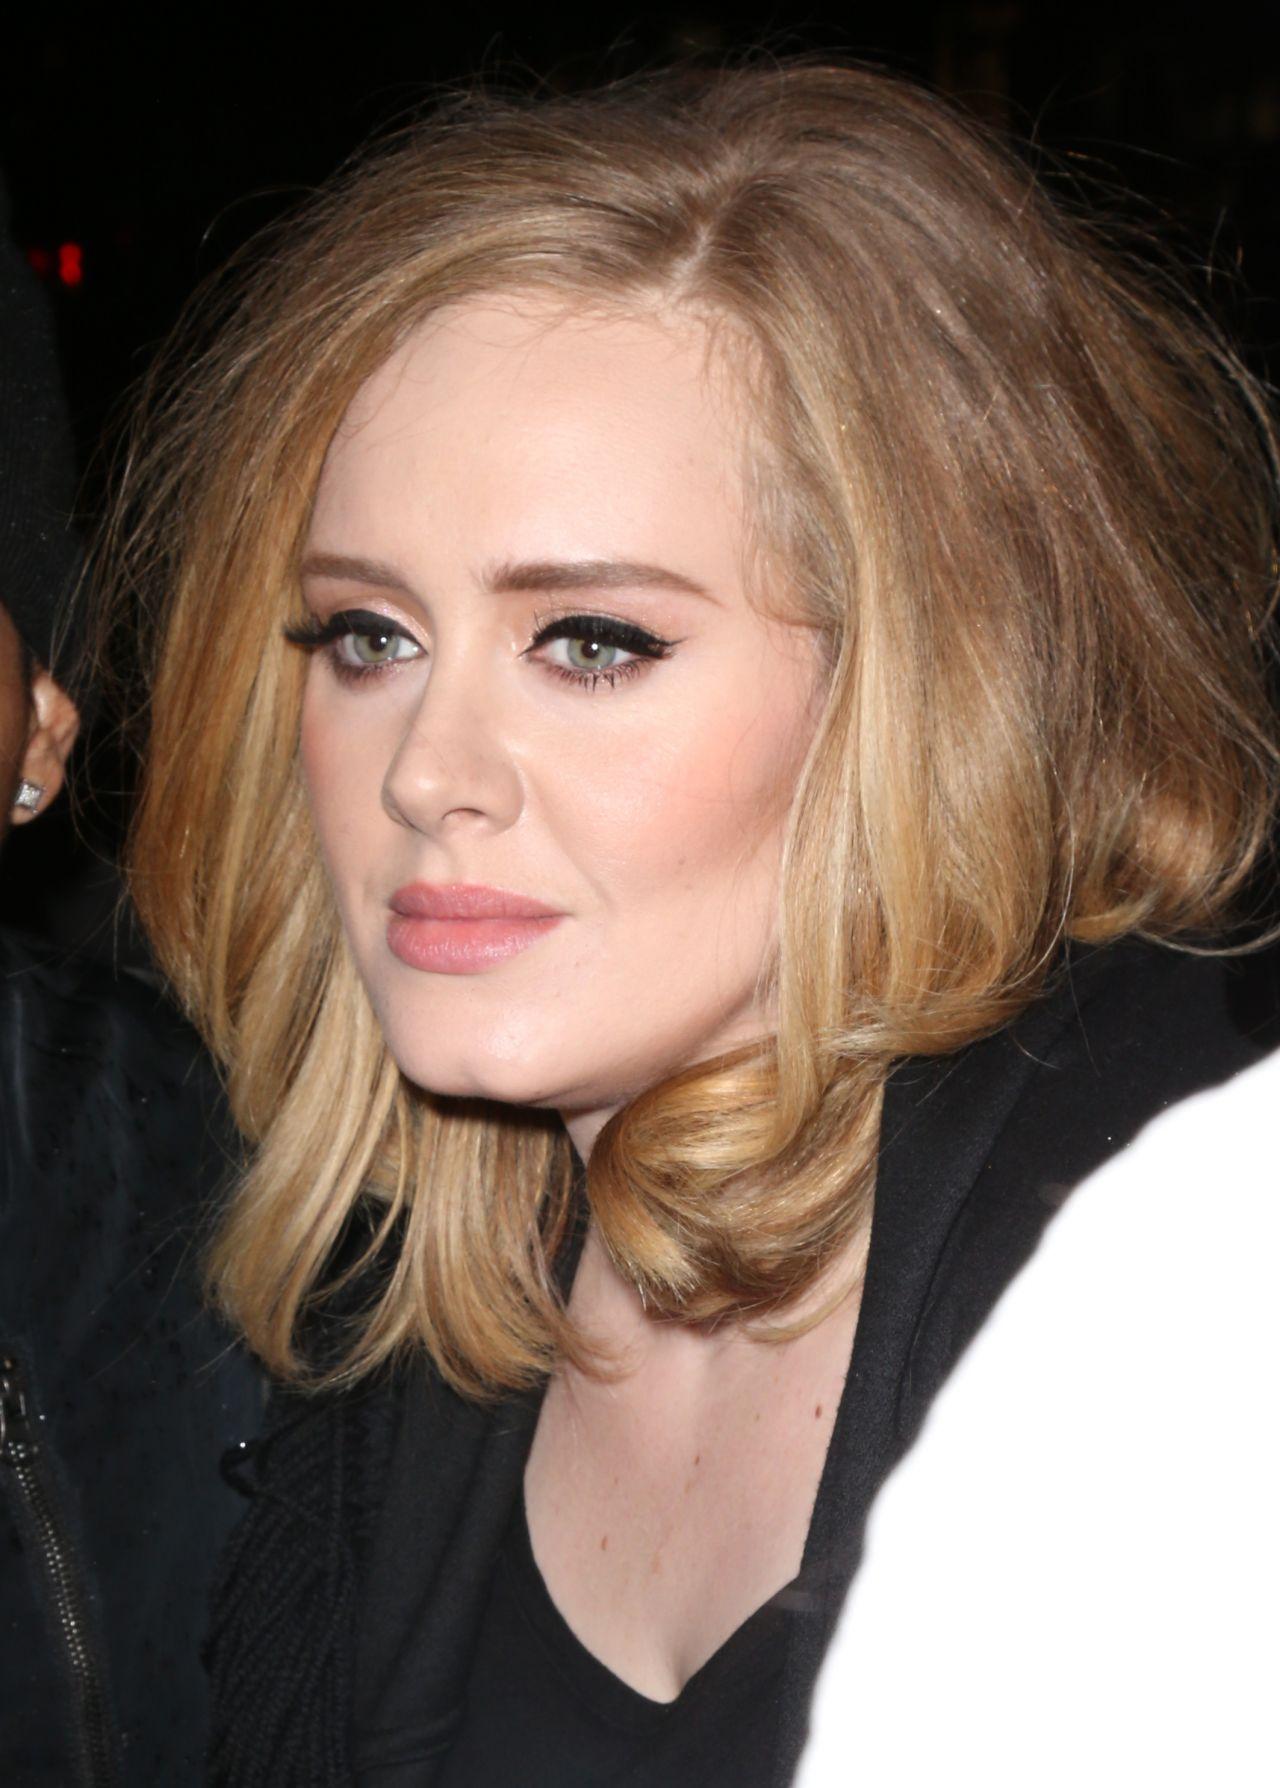 Adele in New York city